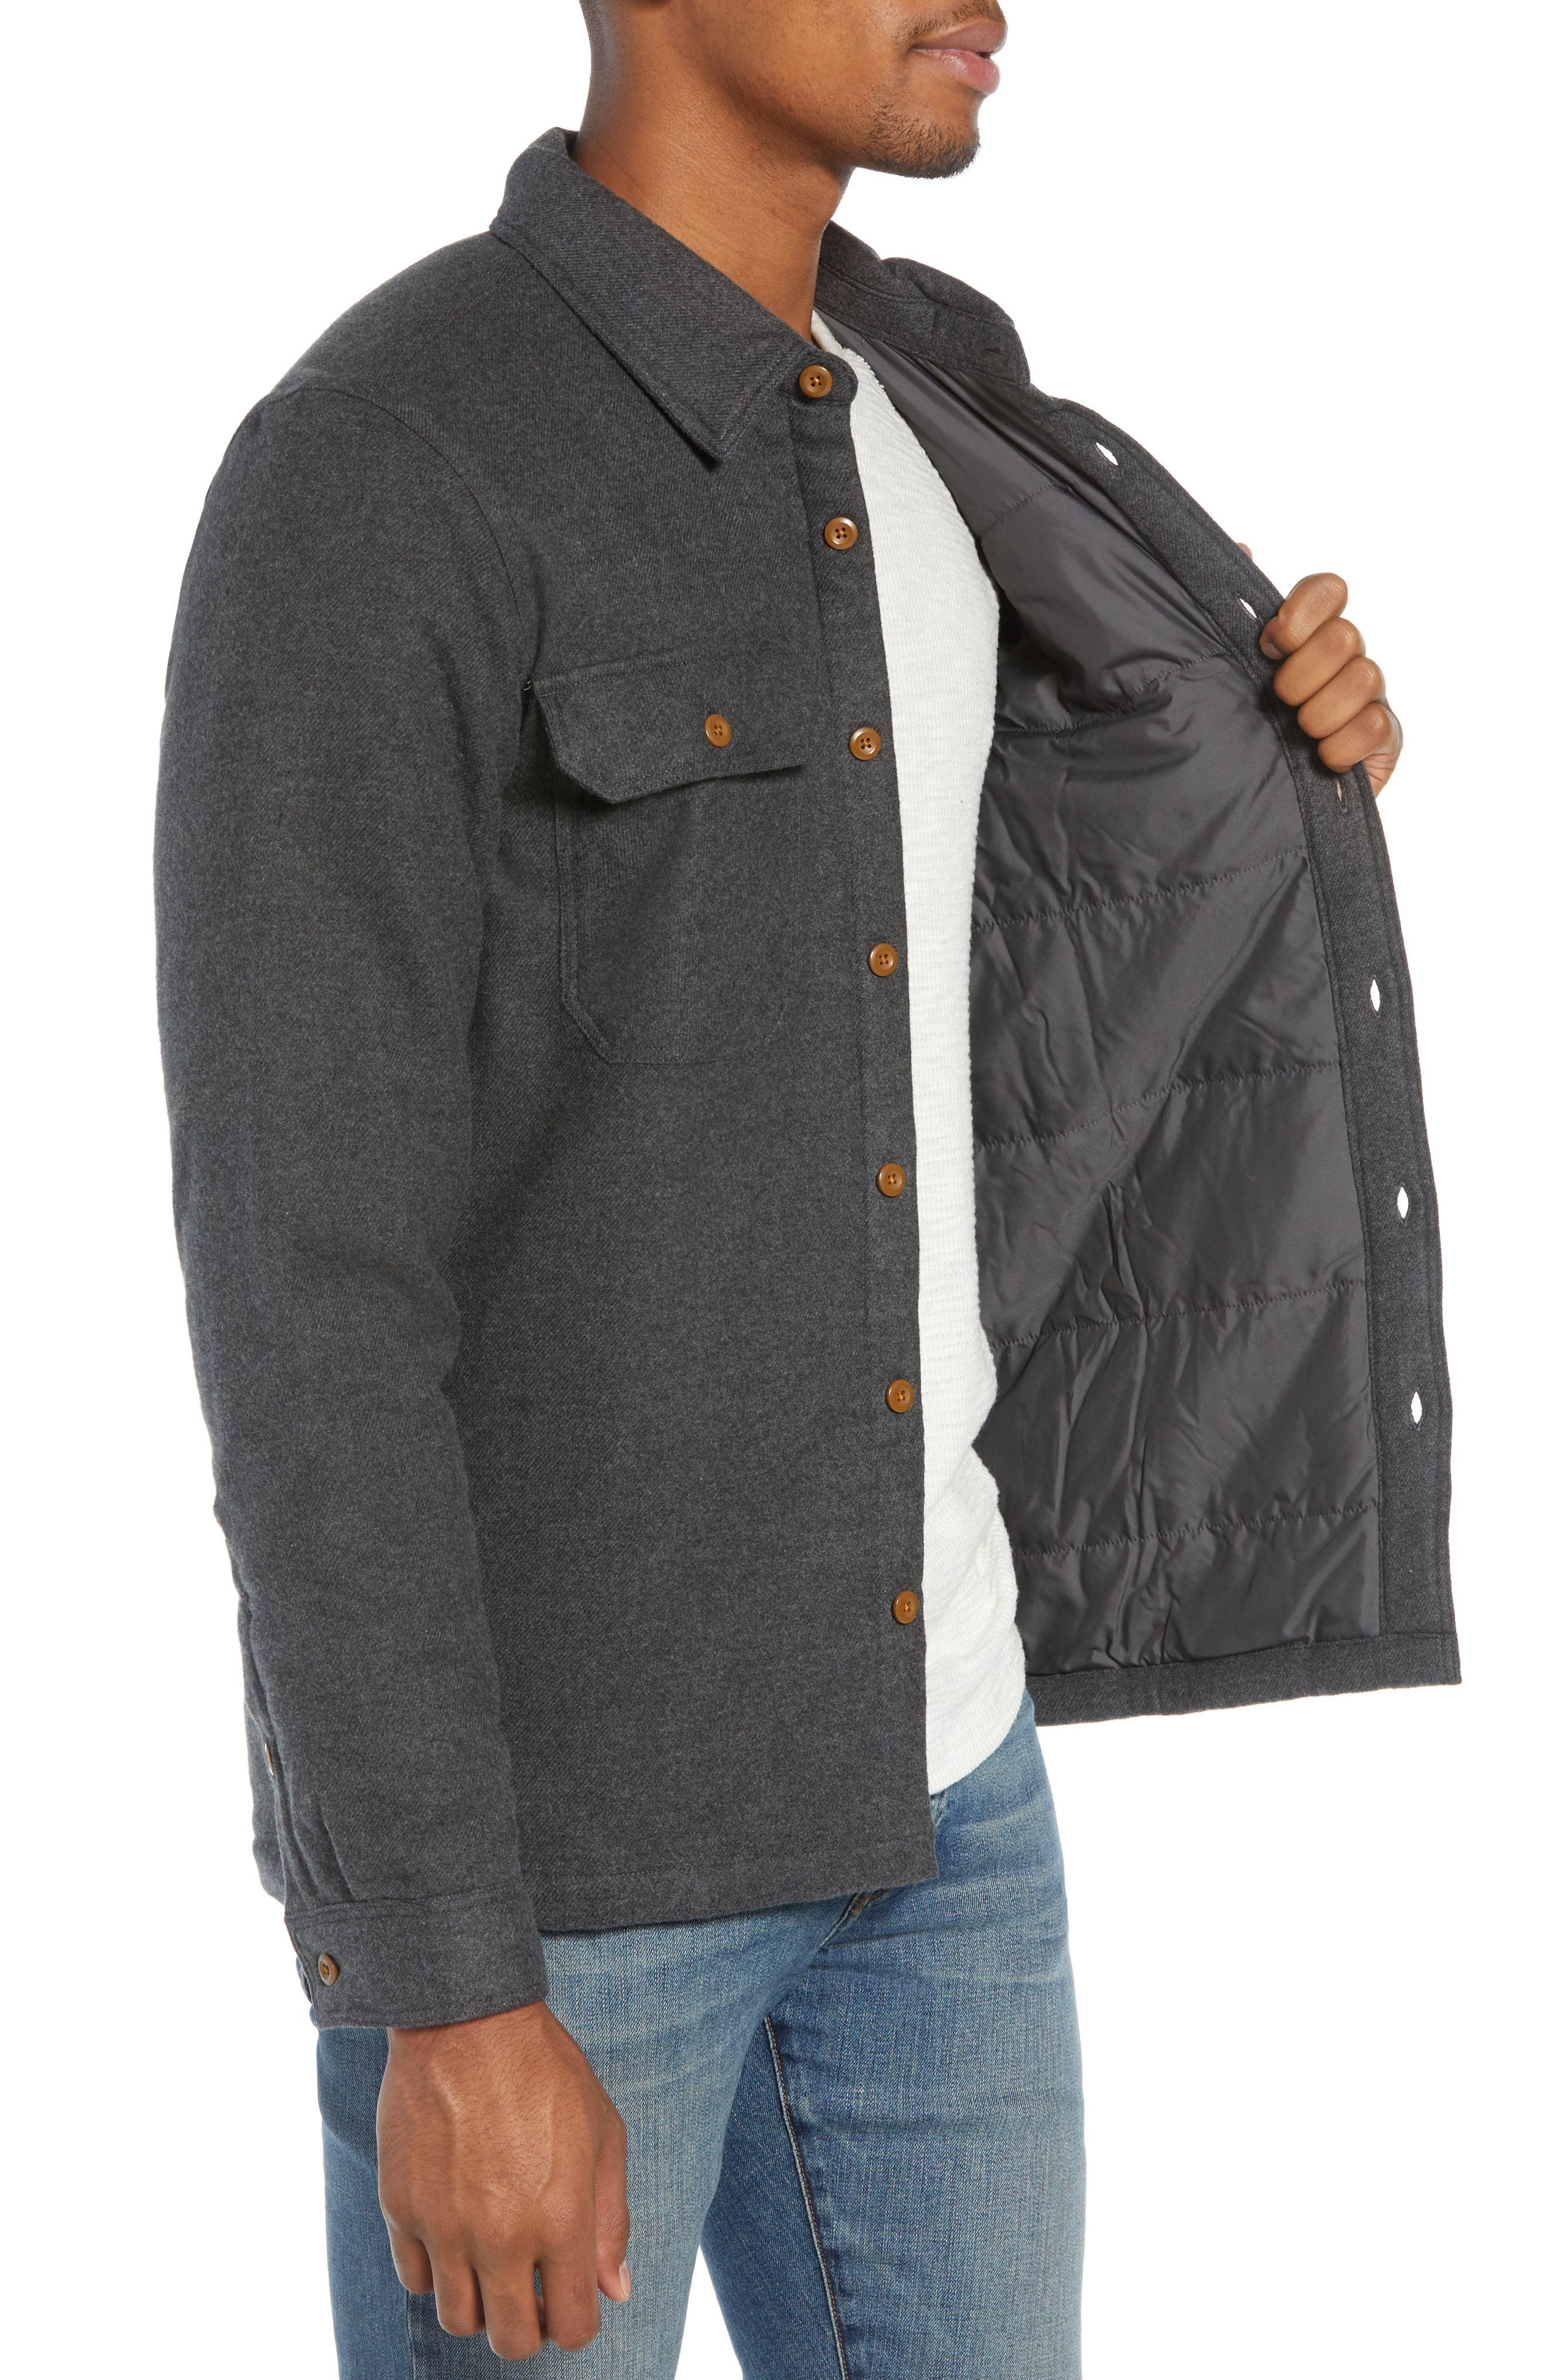 'Fjord' Flannel Shirt Jacket,                             Alternate thumbnail 3, color,                             FORGE GREY